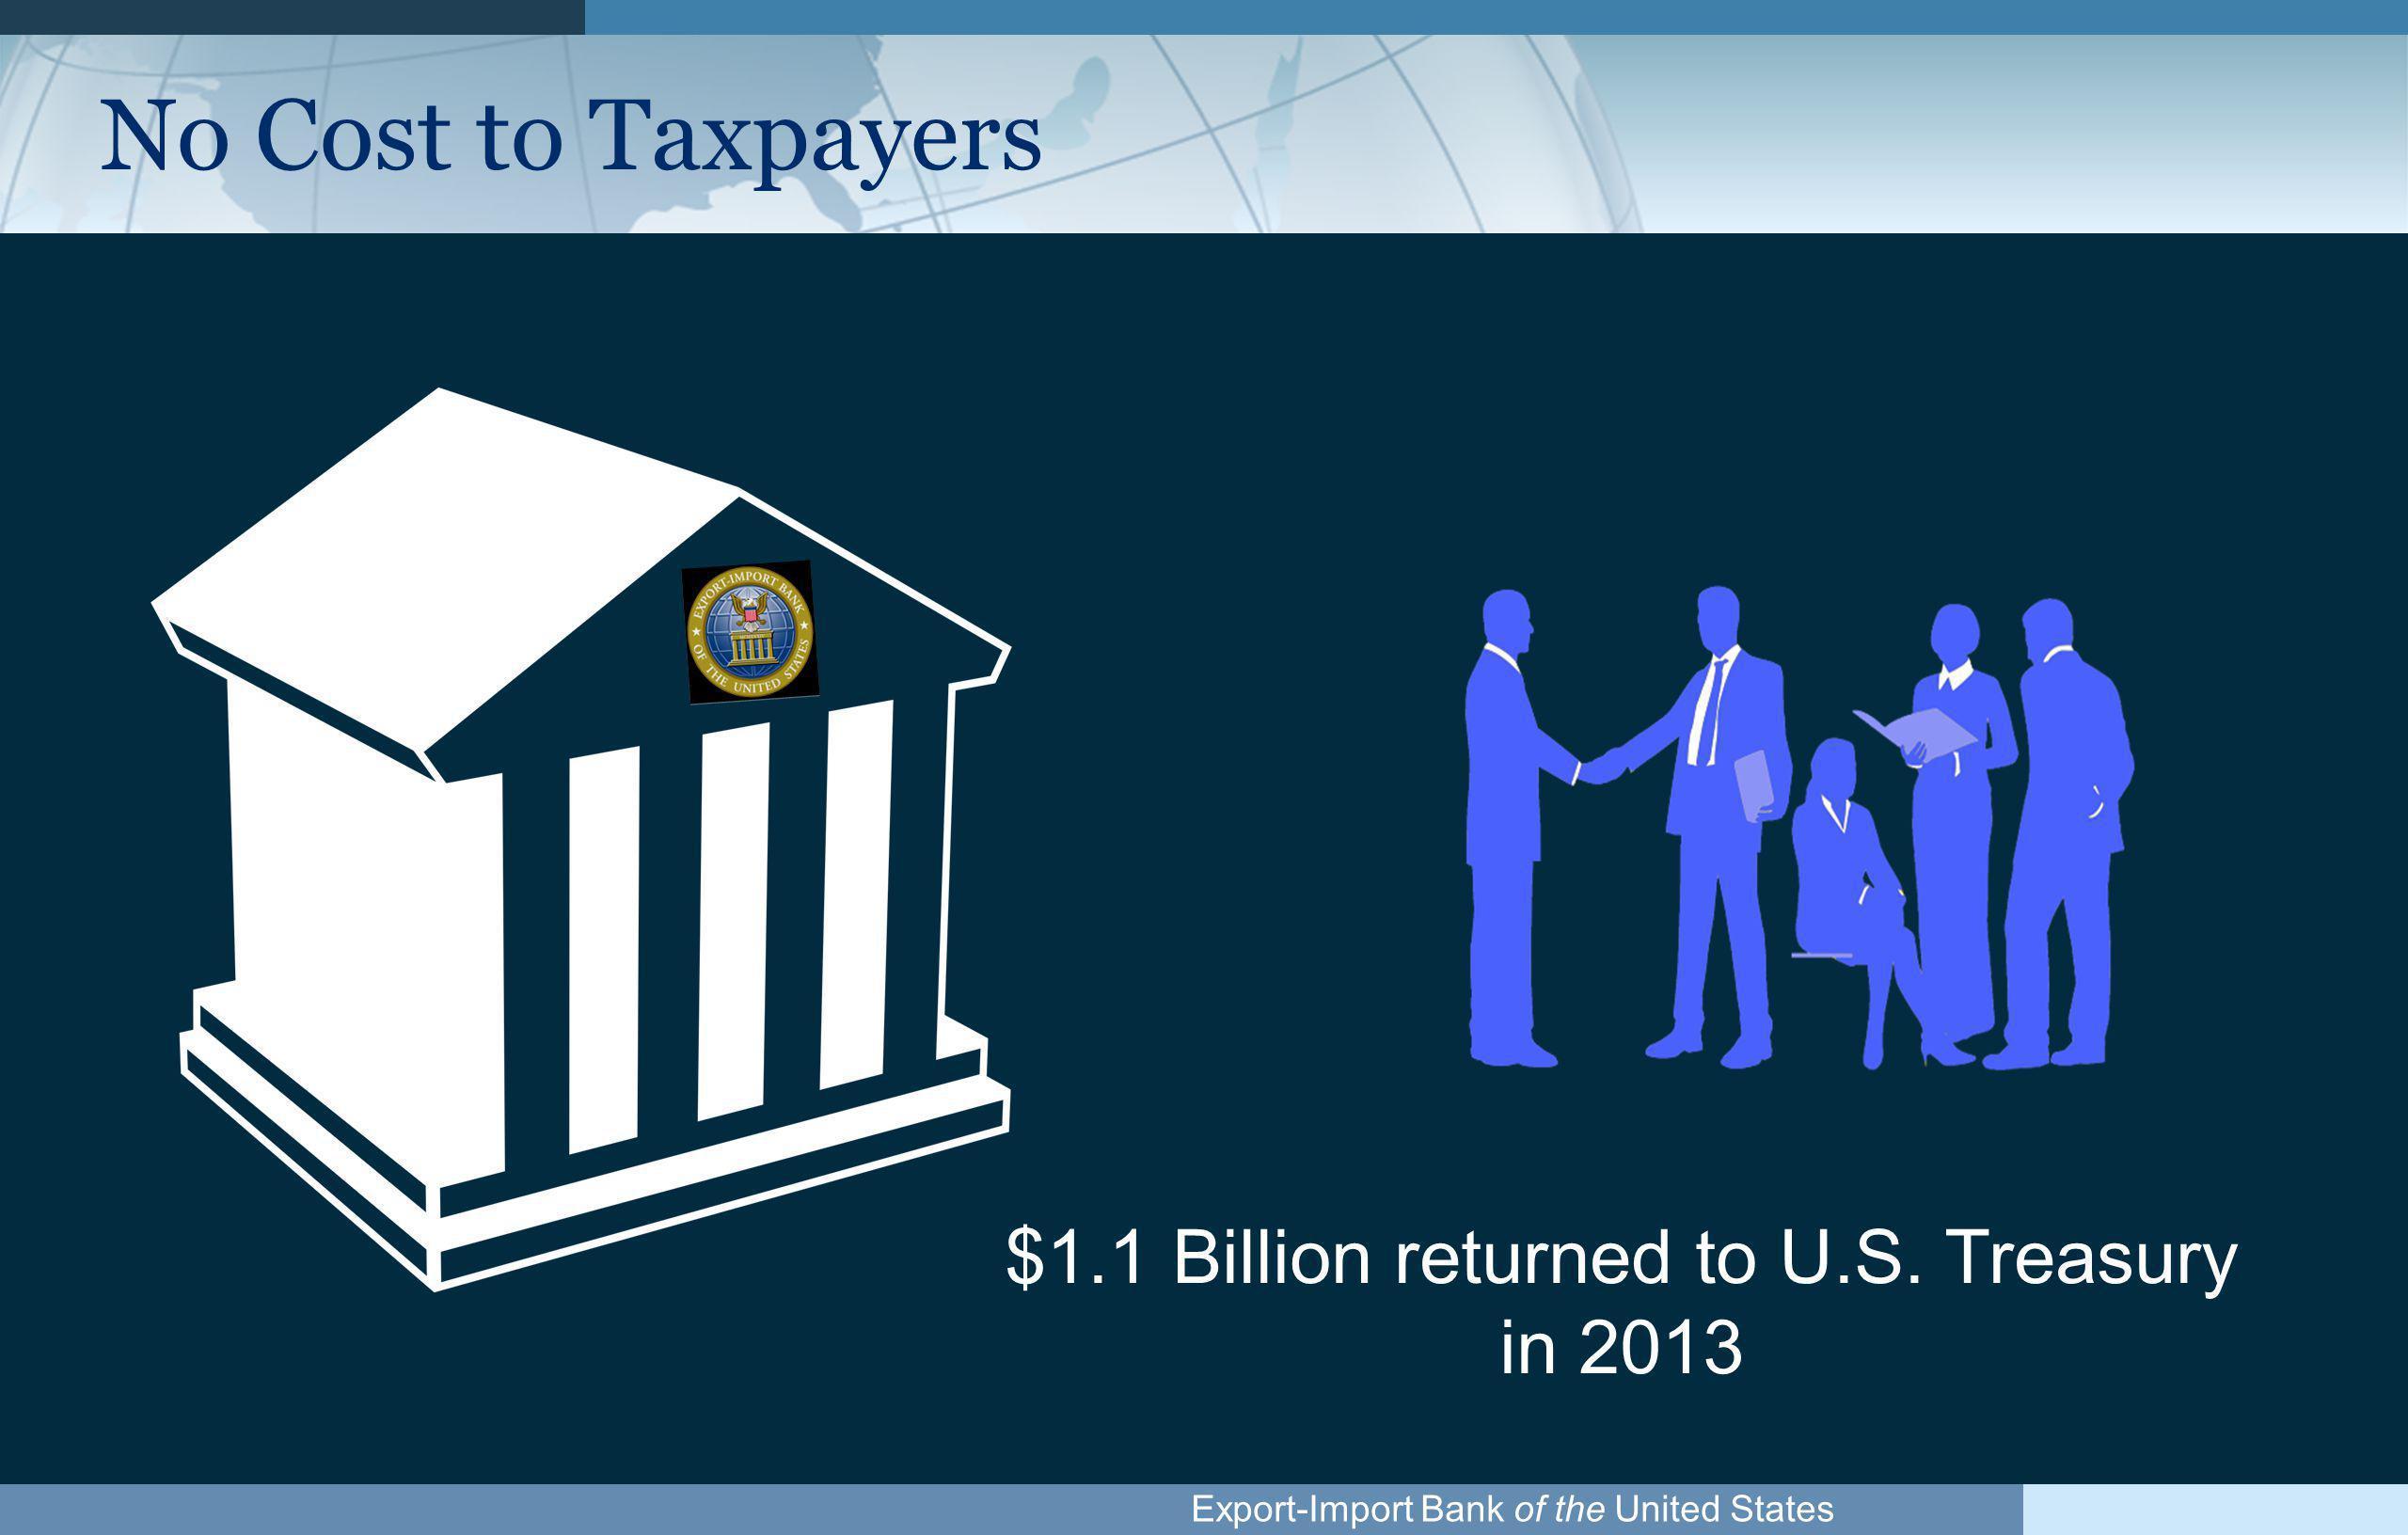 Export-Import Bank of the United States $1.1 Billion returned to U.S.